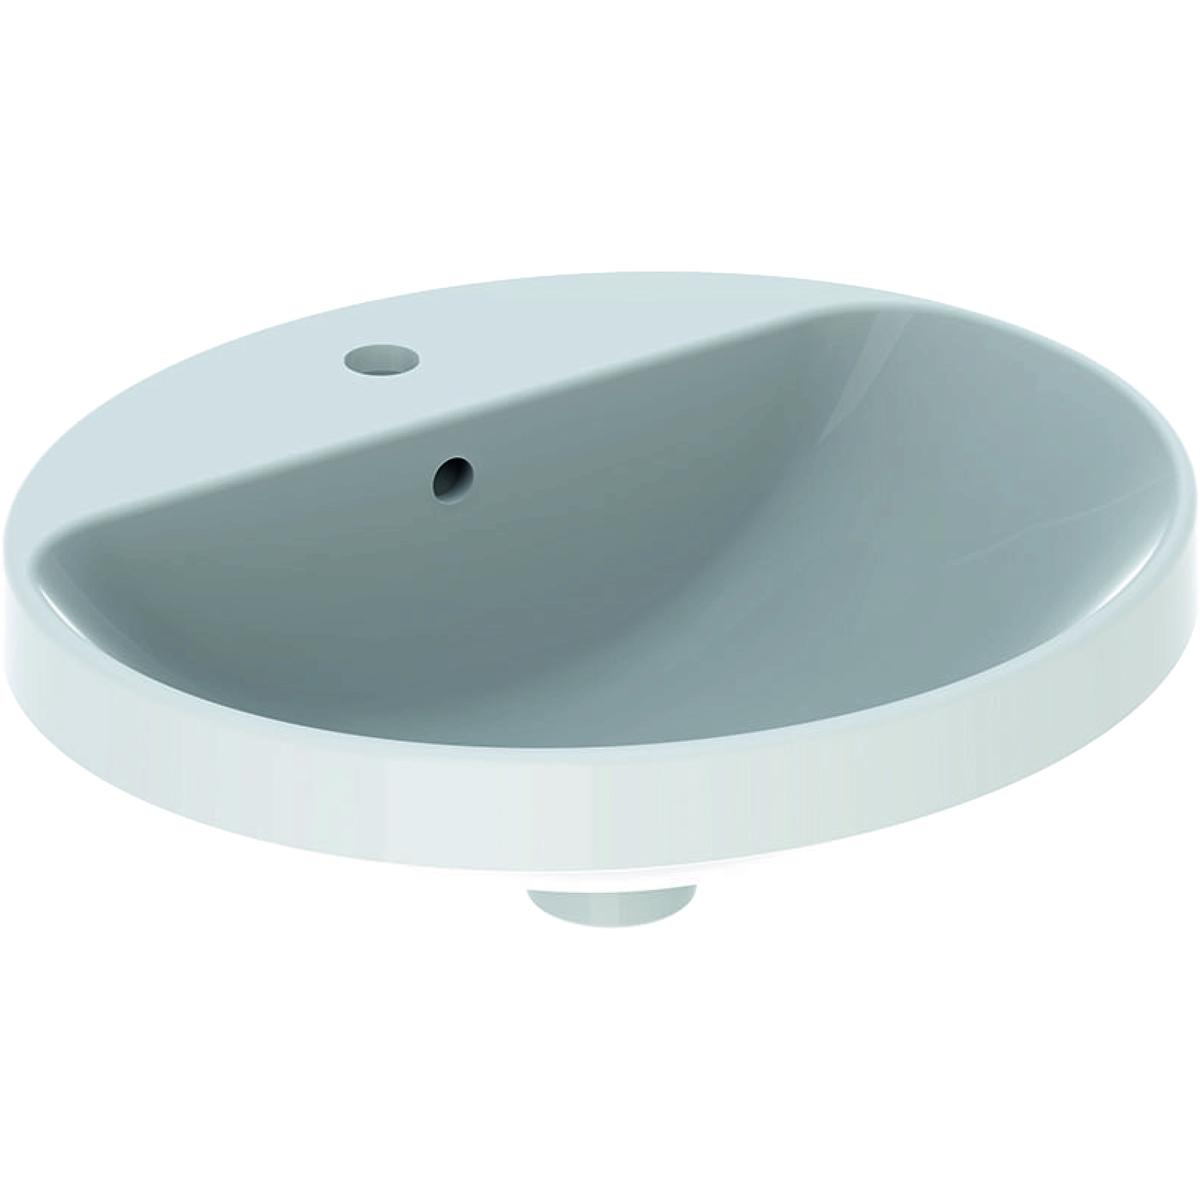 Lavoar oval Geberit VariForm 50x45cm montare in blat alb imagine sensodays.ro